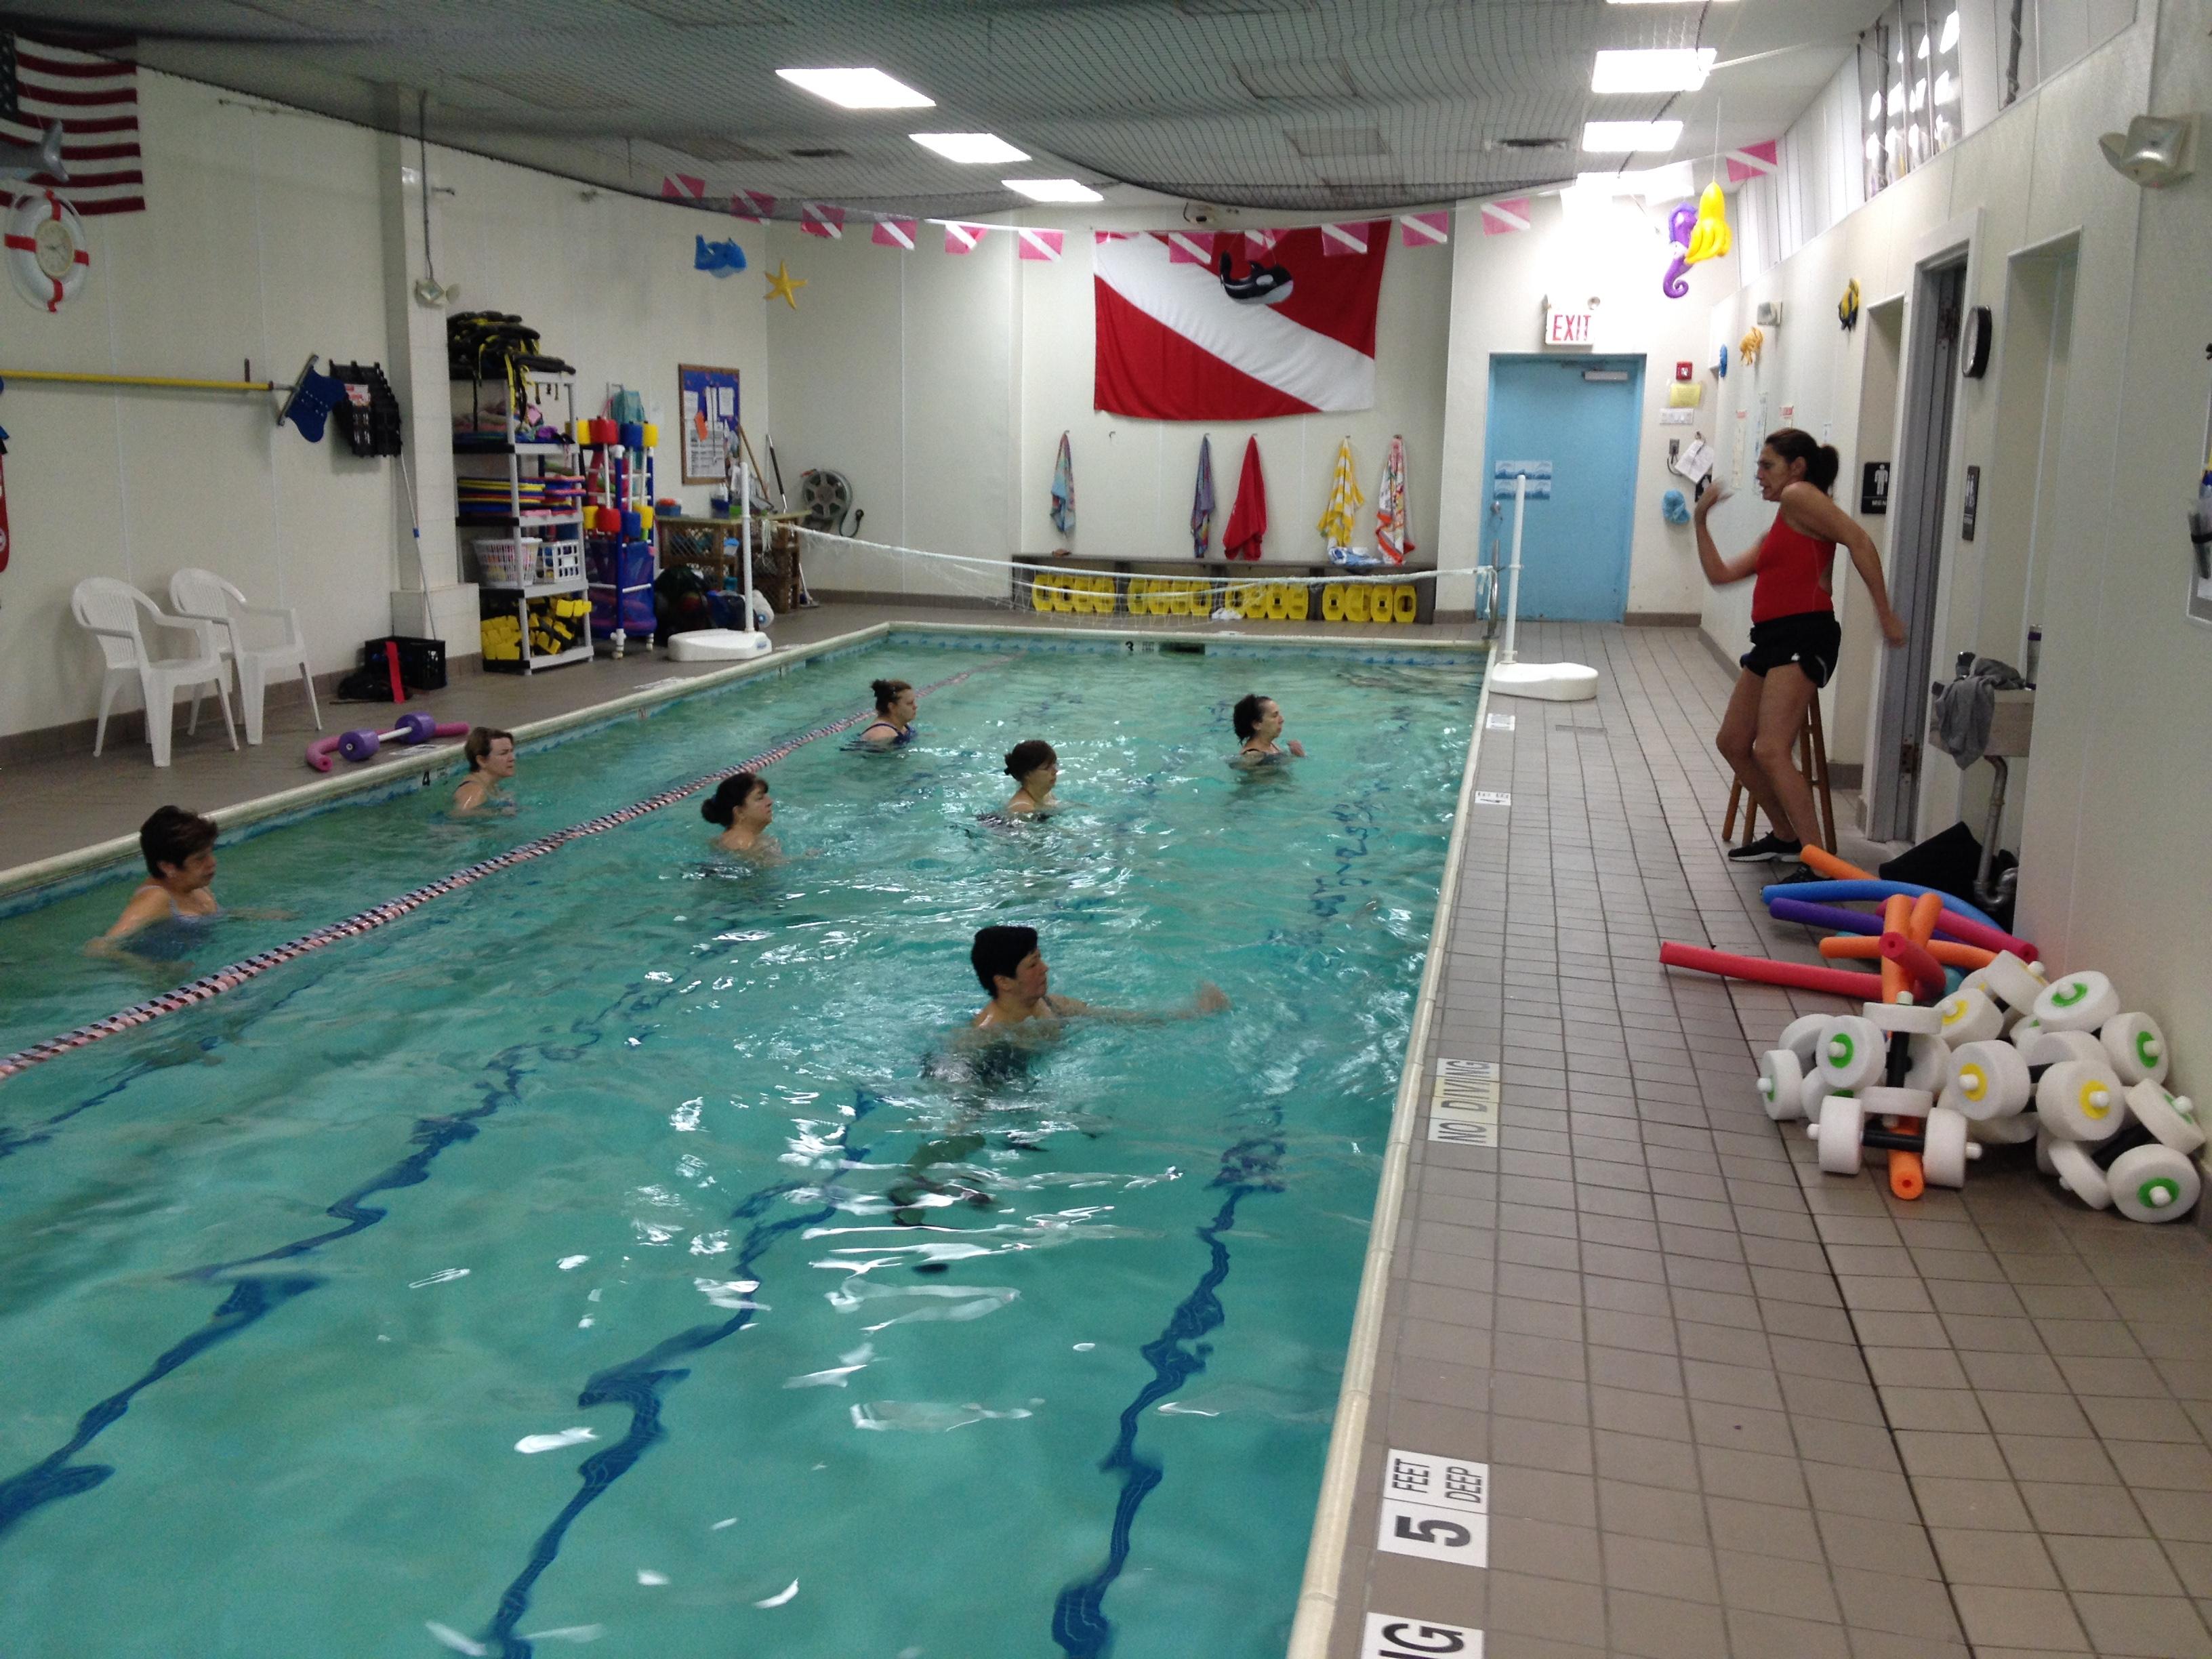 Swim and Scuba Heated Pool: Center for Aquatics Training